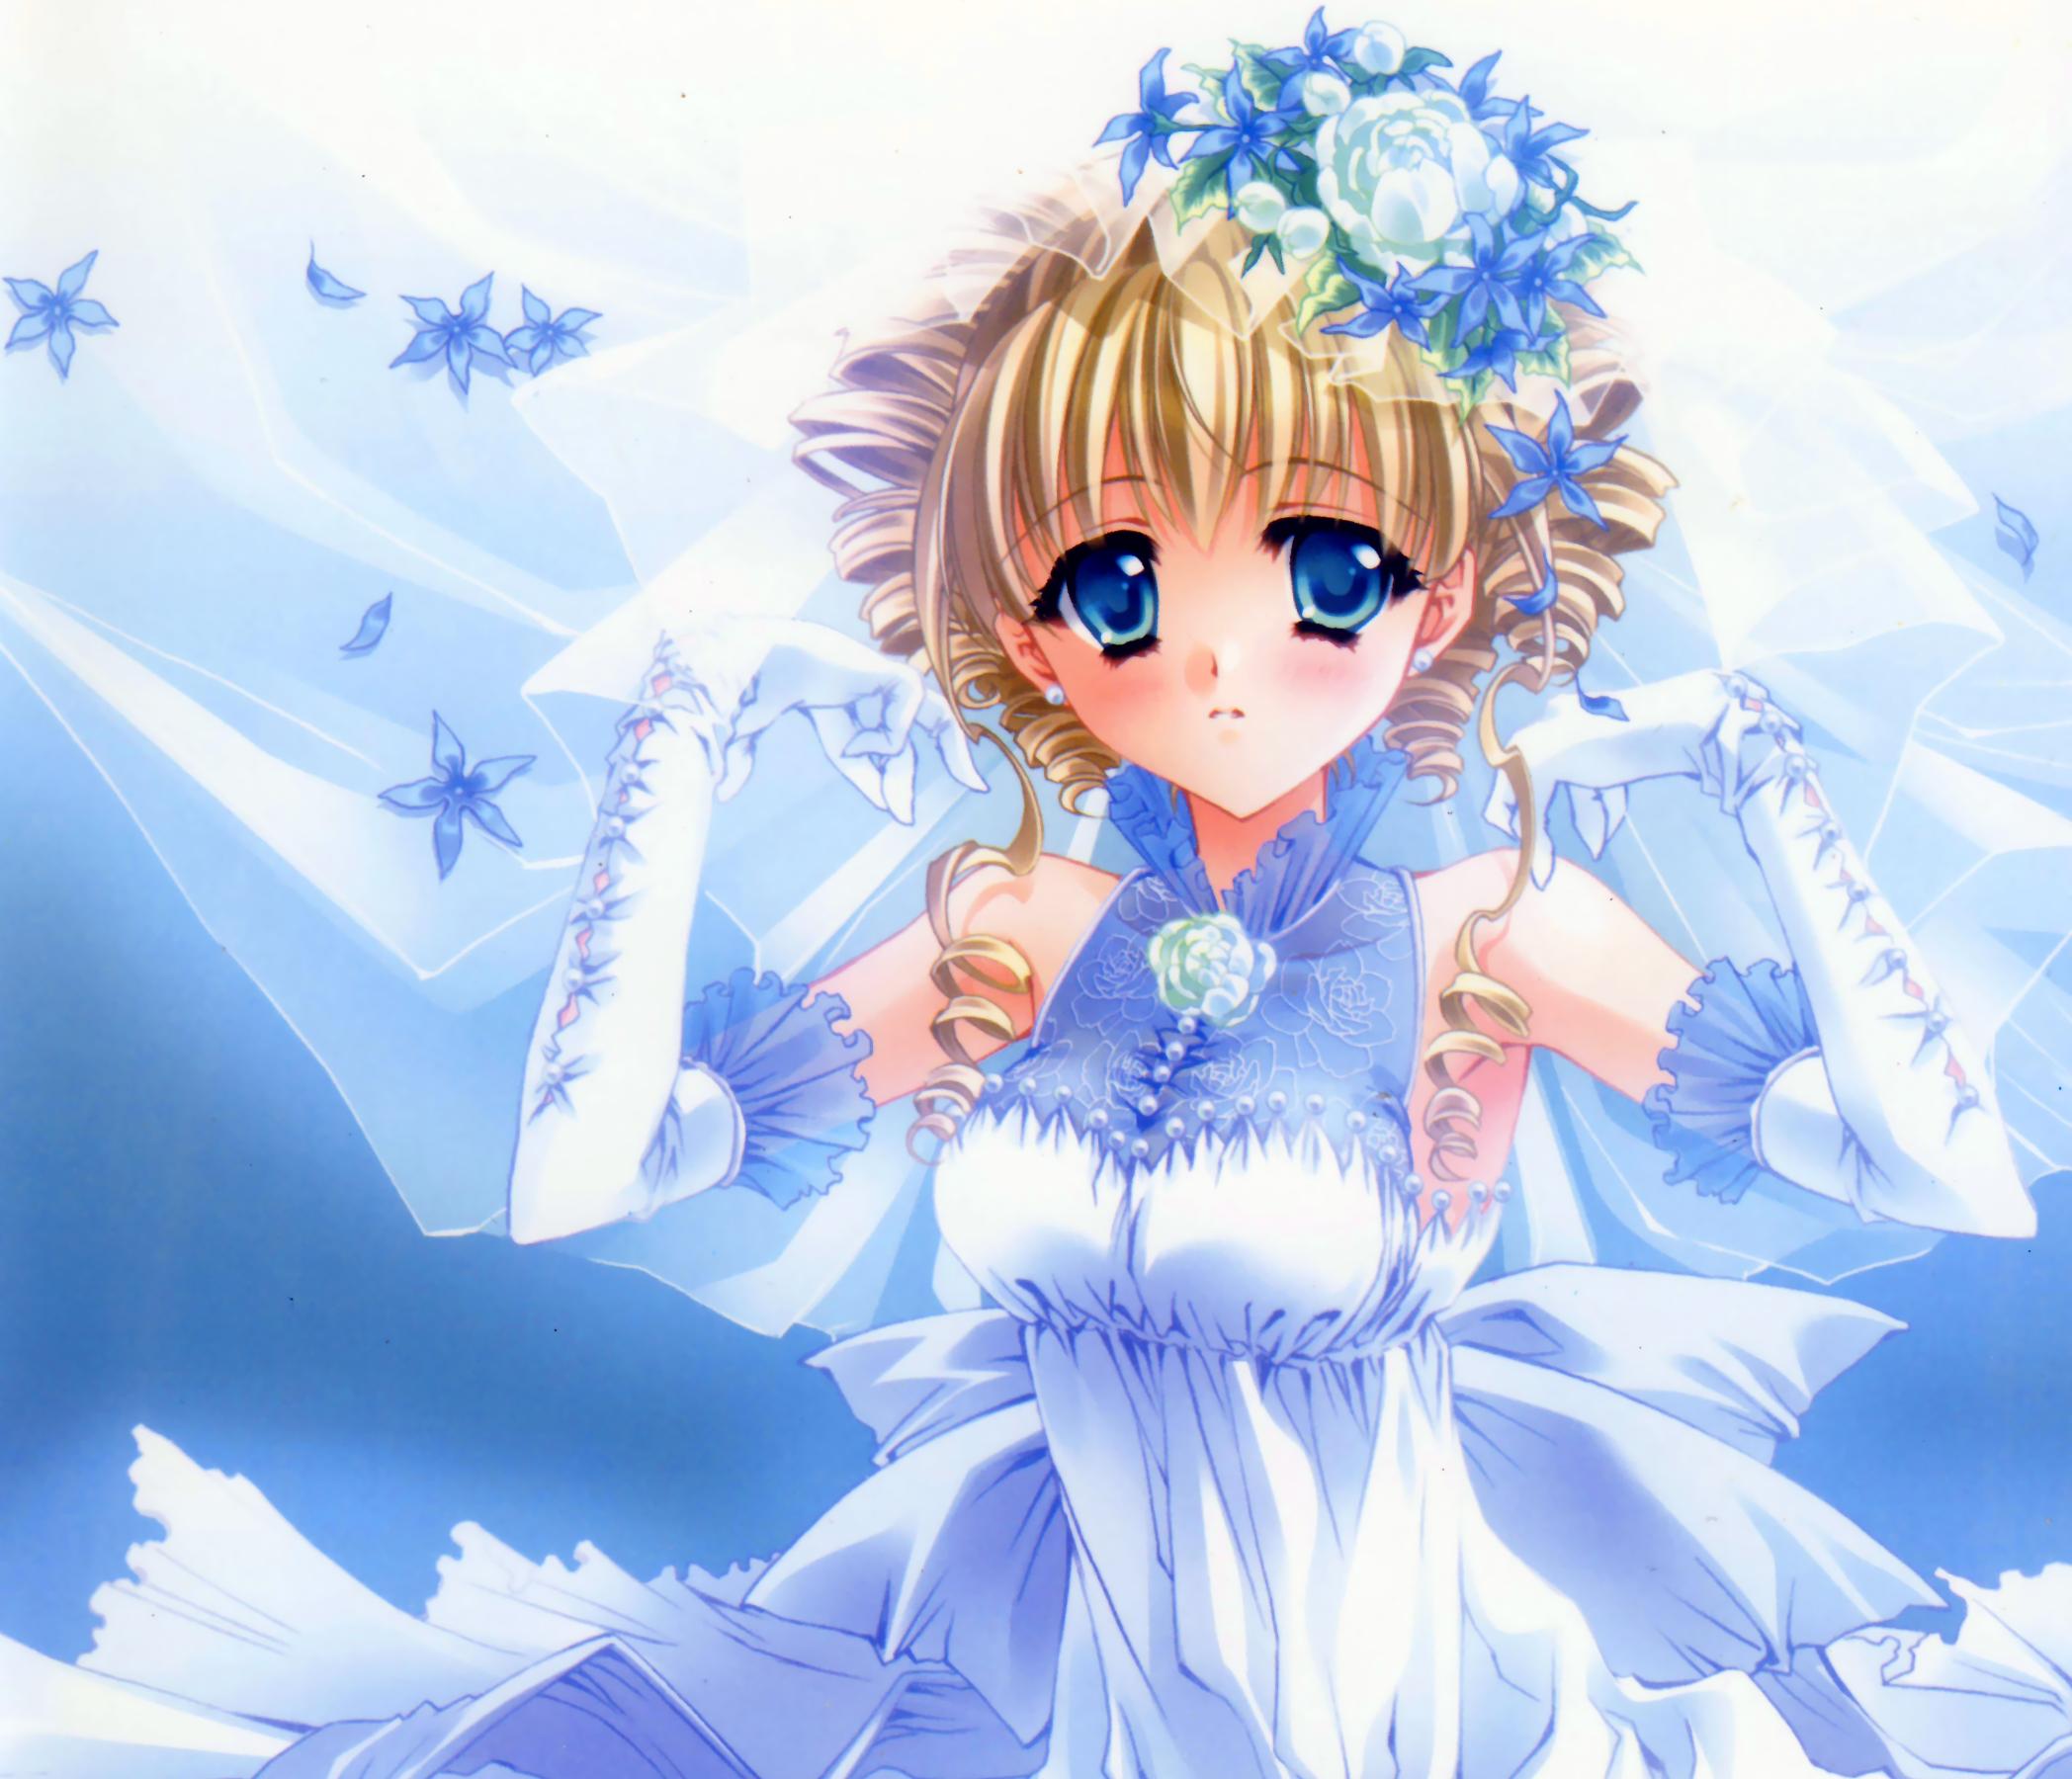 Blonde Blue Eyes Blush Flower Glove Short Hair Wedding Dress 2096x1800